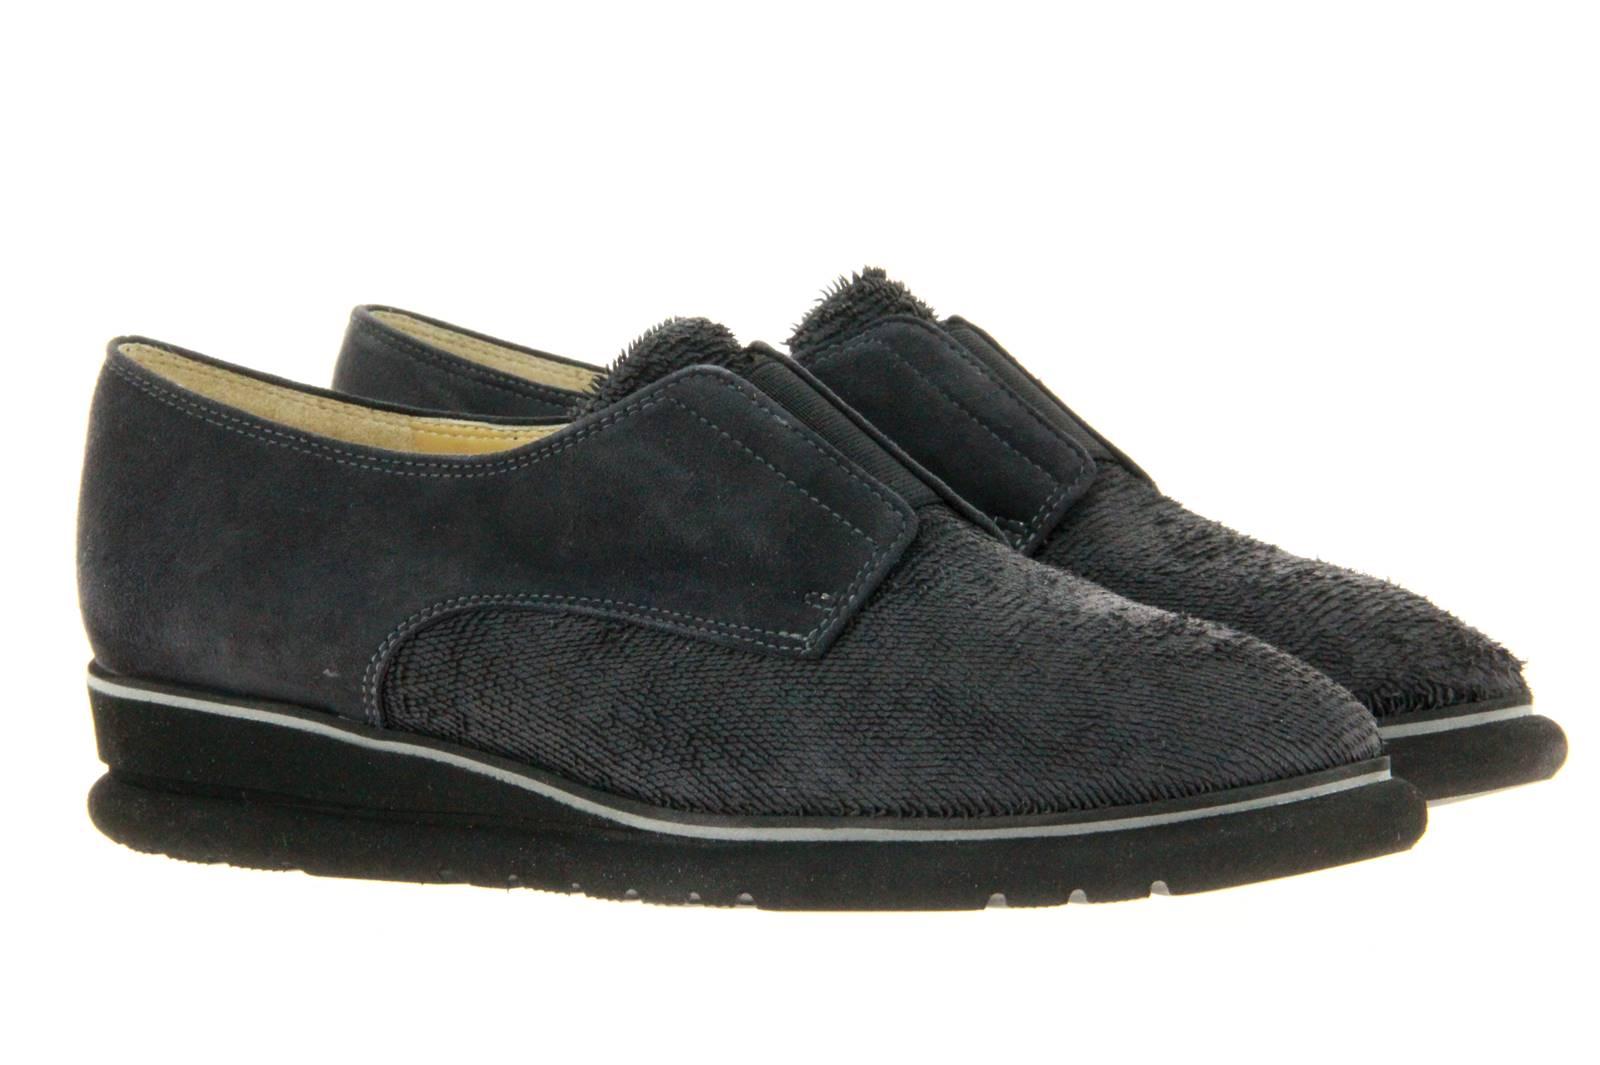 Brunate slipper LUCY W VELA CARBON CAMOSCIO CARBON